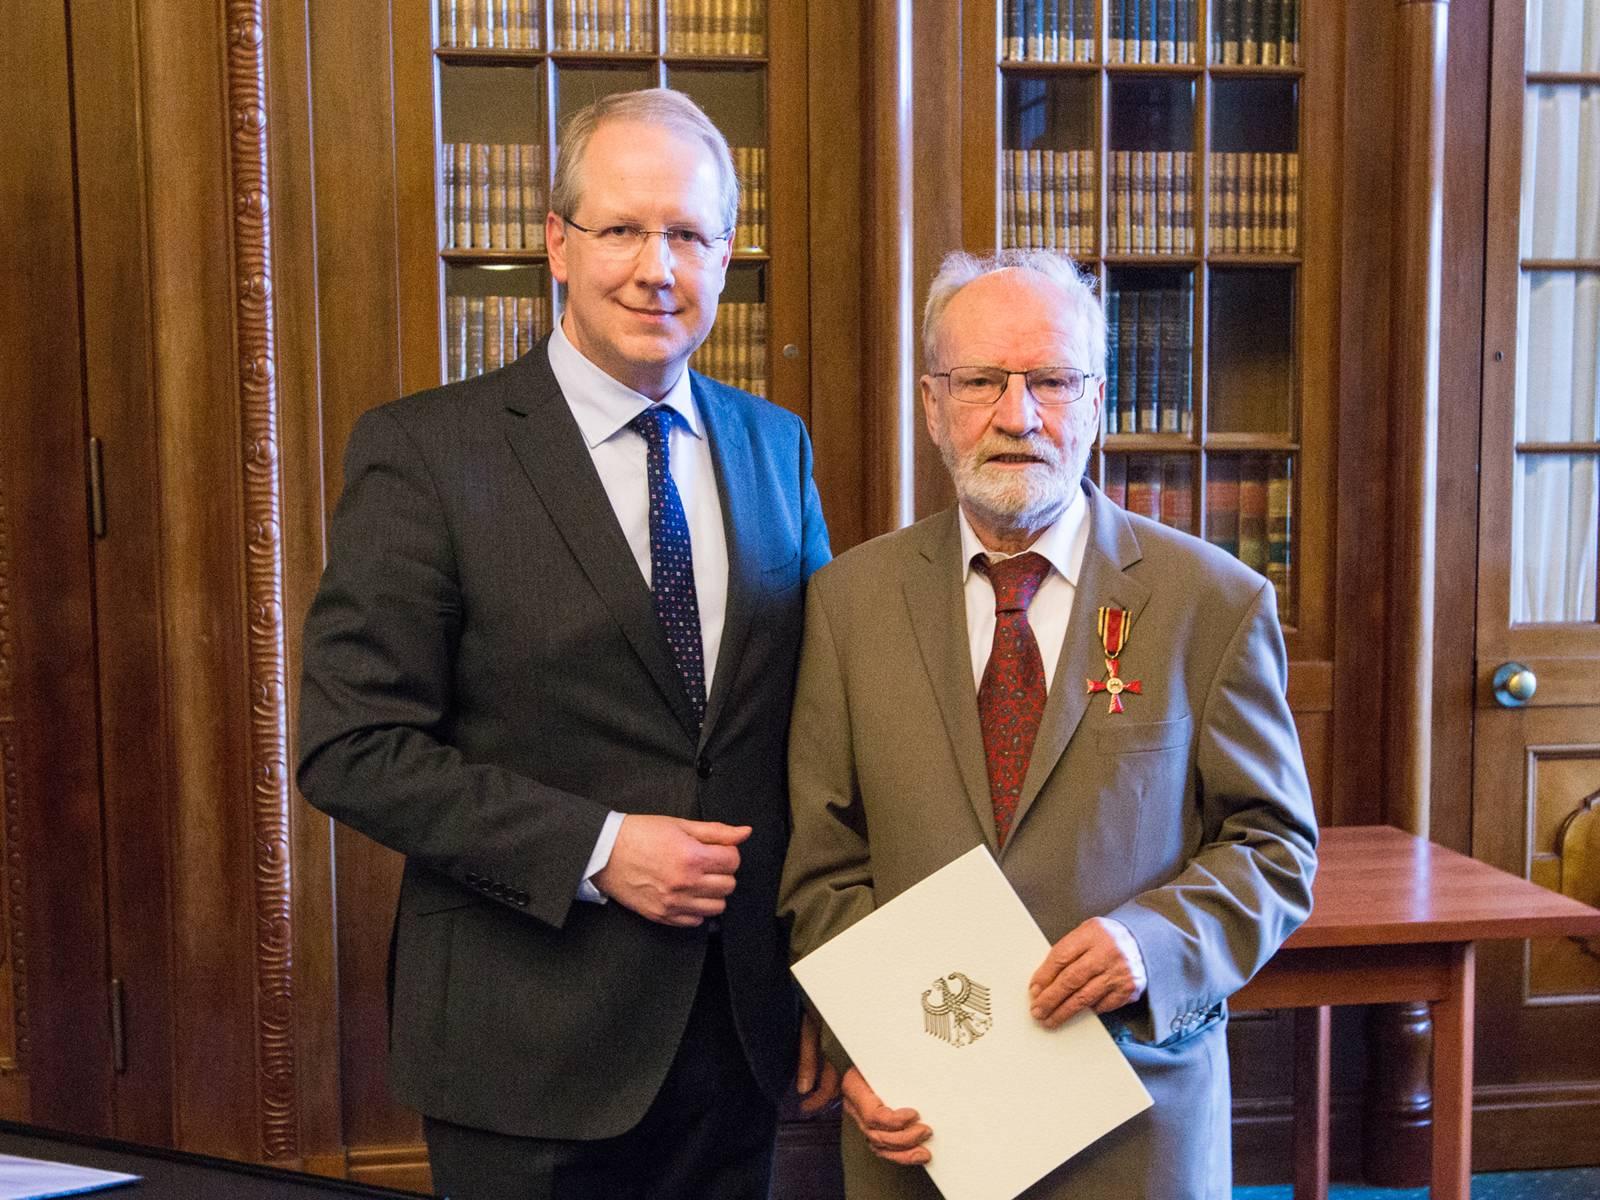 Oberbürgermeister Stefan Schostok und Dr. Christian Buhmann